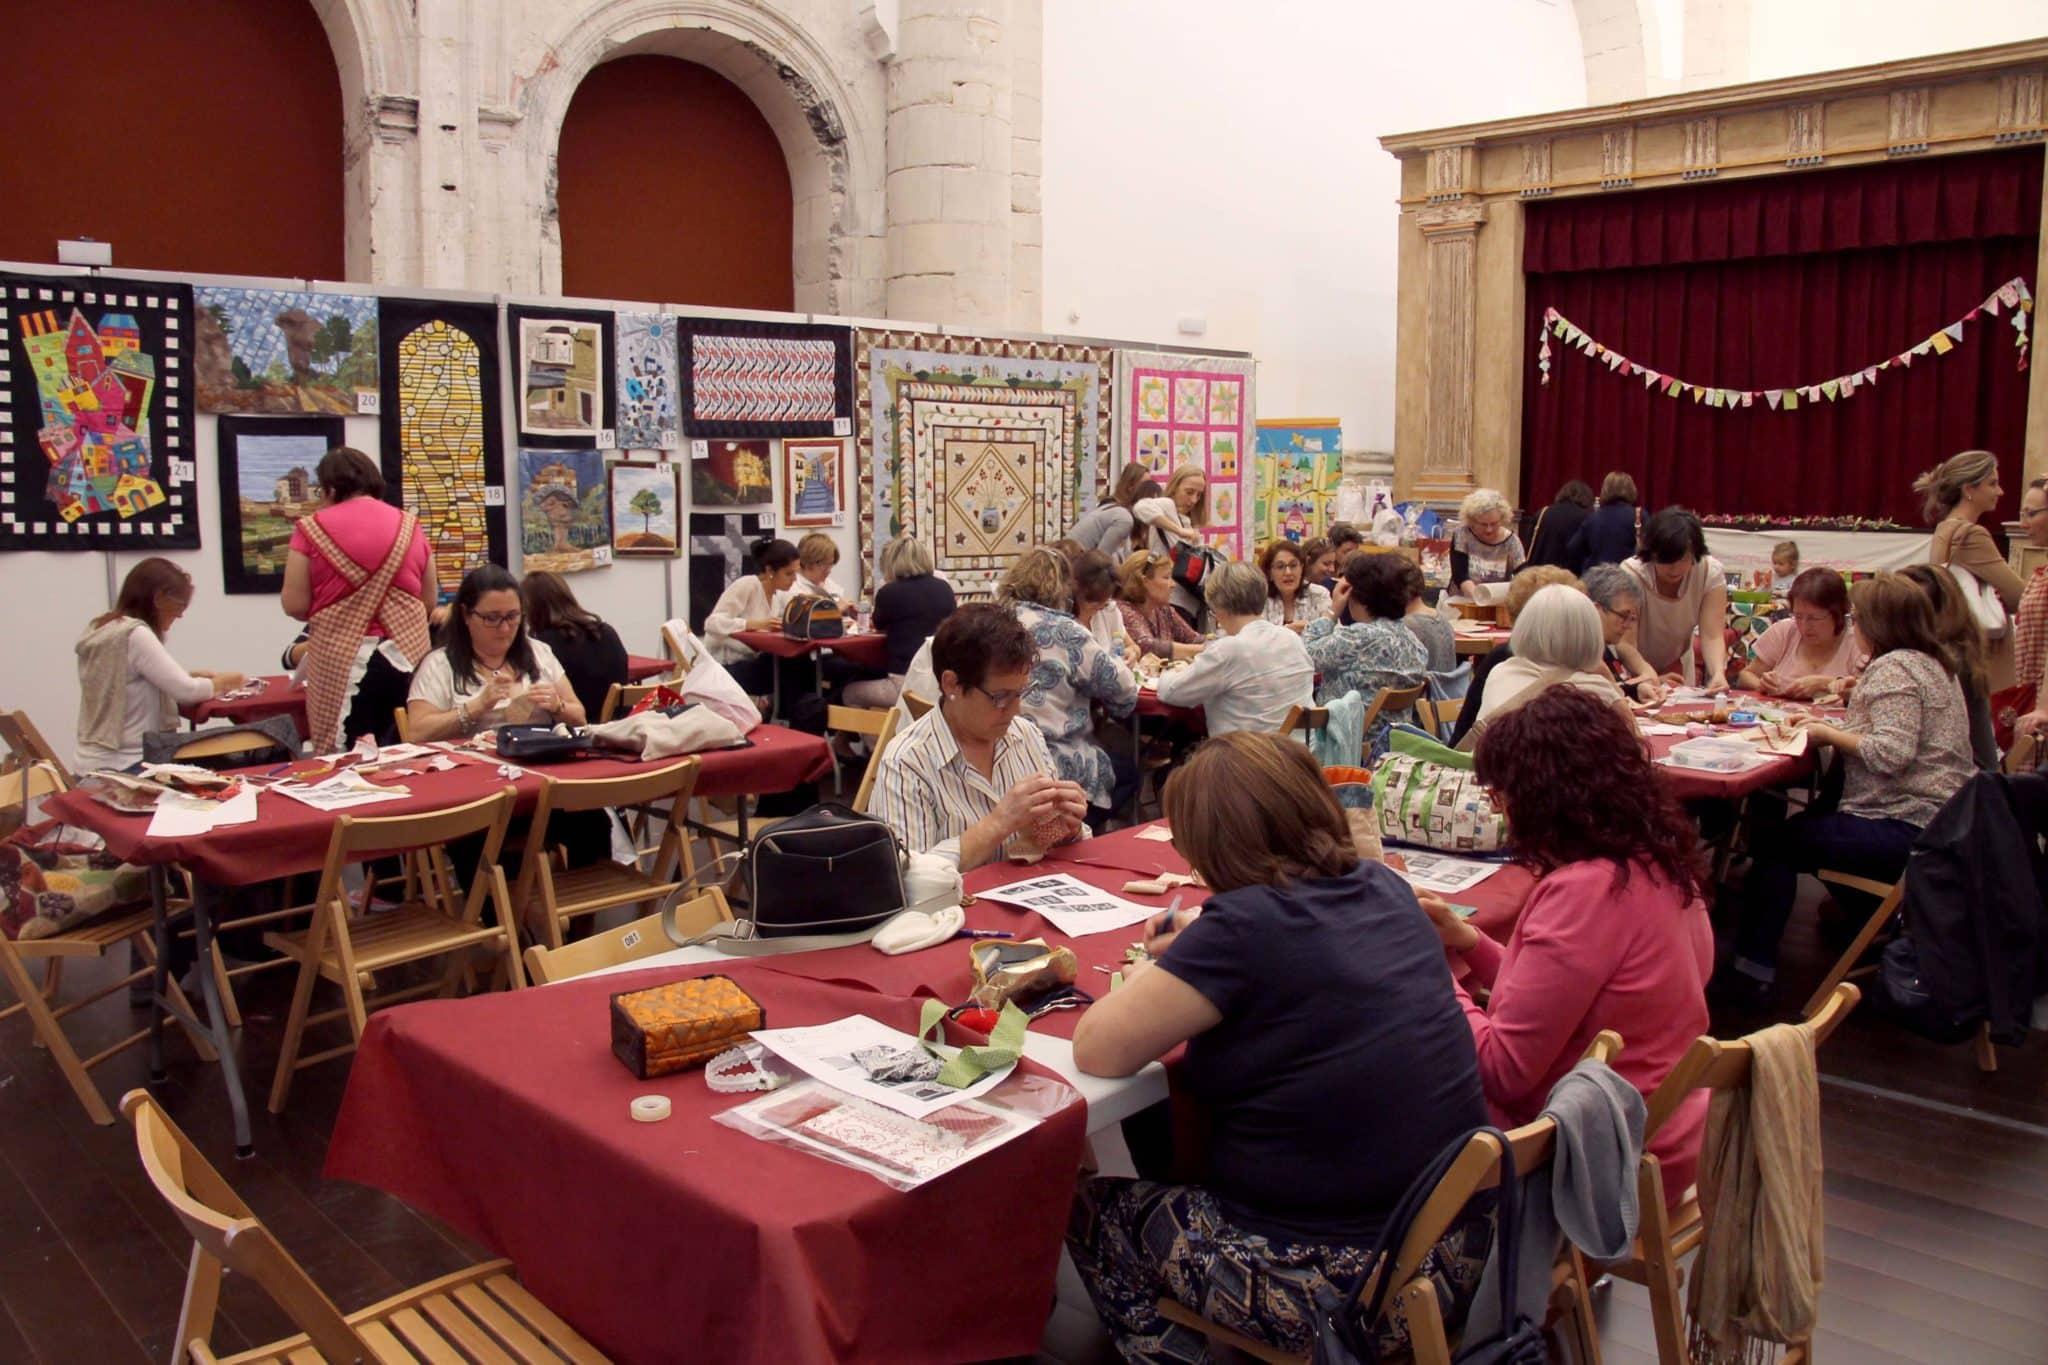 Éxito del I Concurso-Exposición-Taller de Patchwork 'Cuenca Encantada'